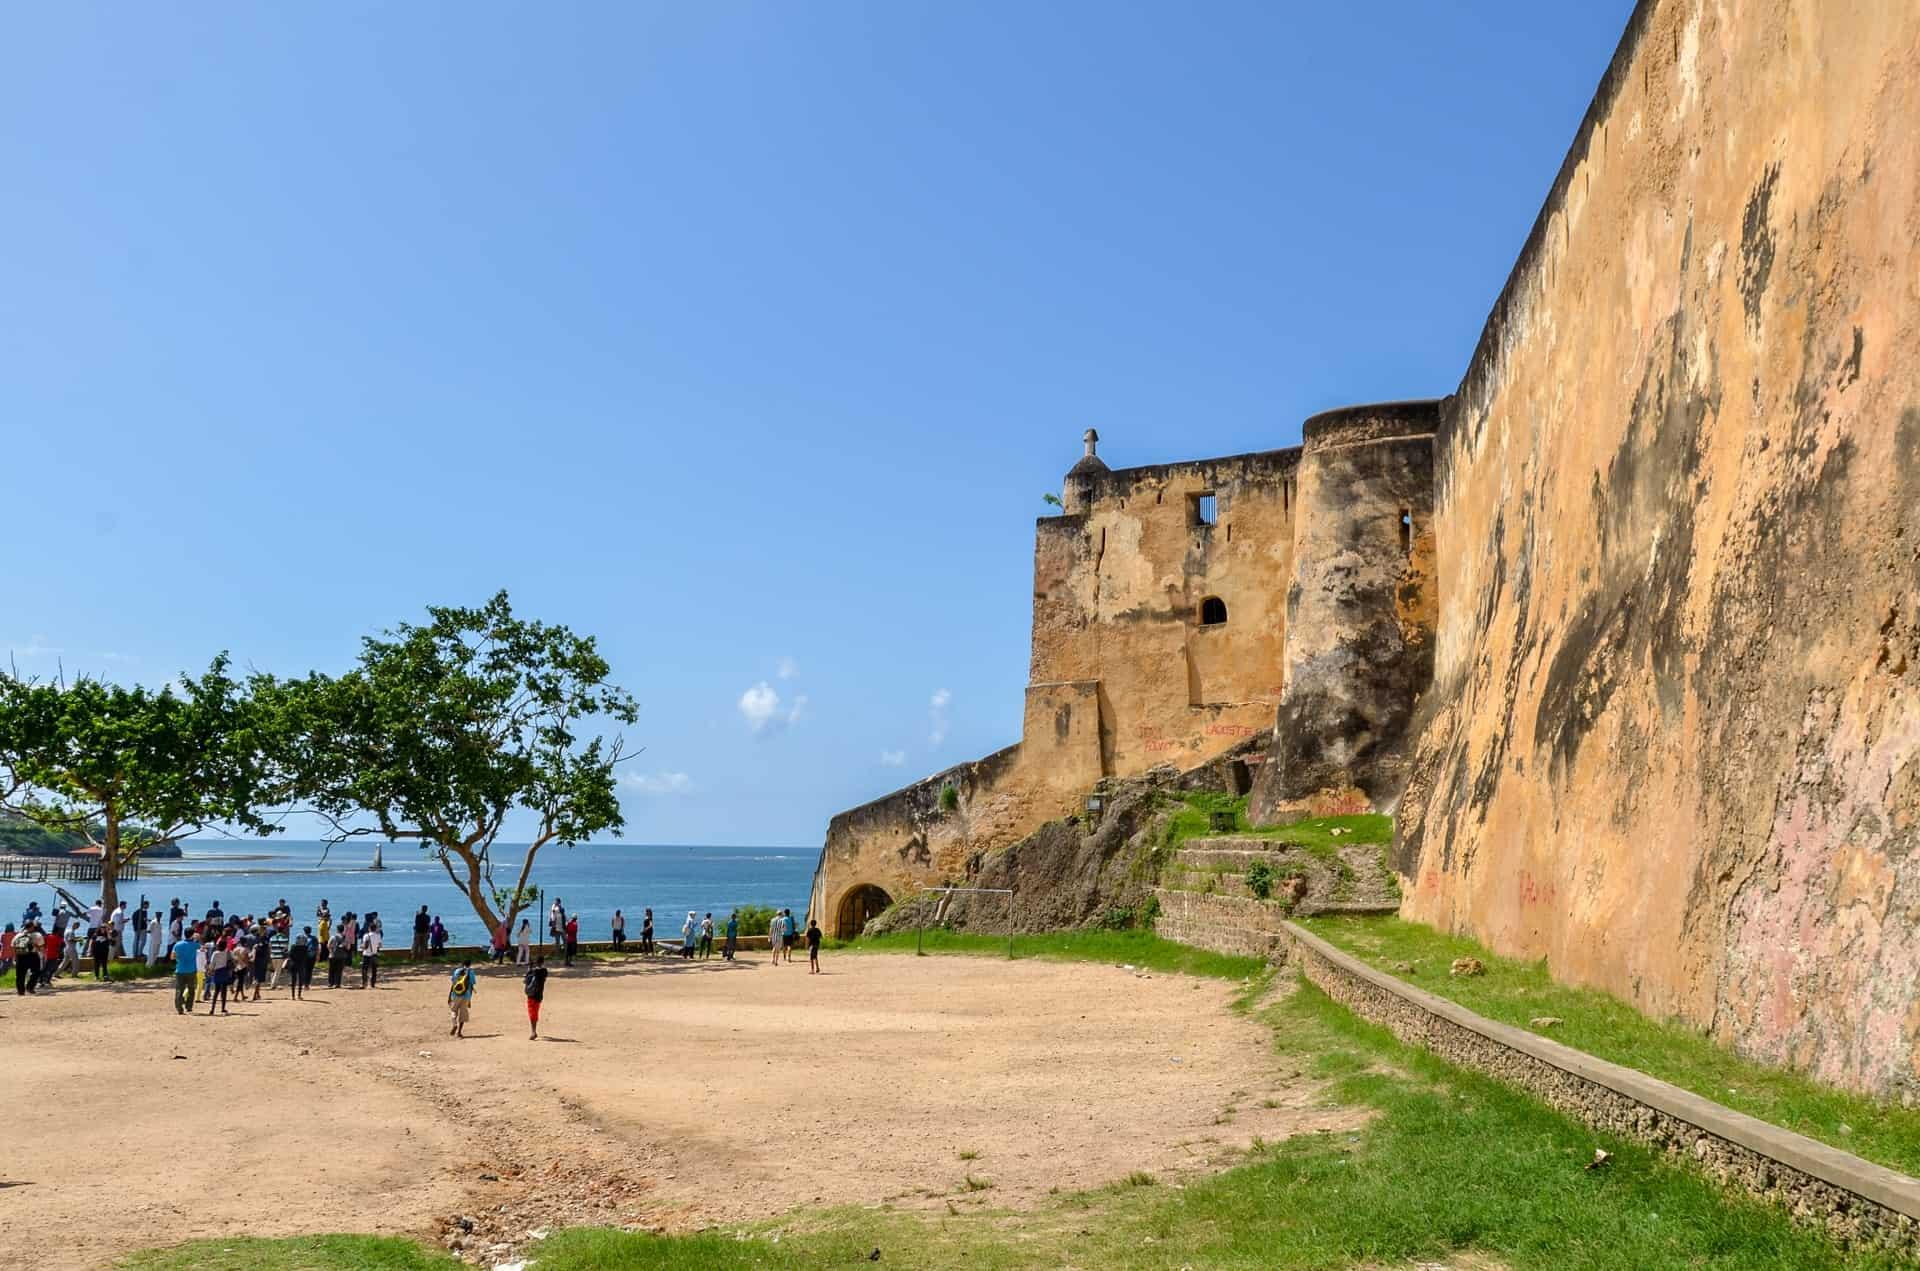 fort jesus monument